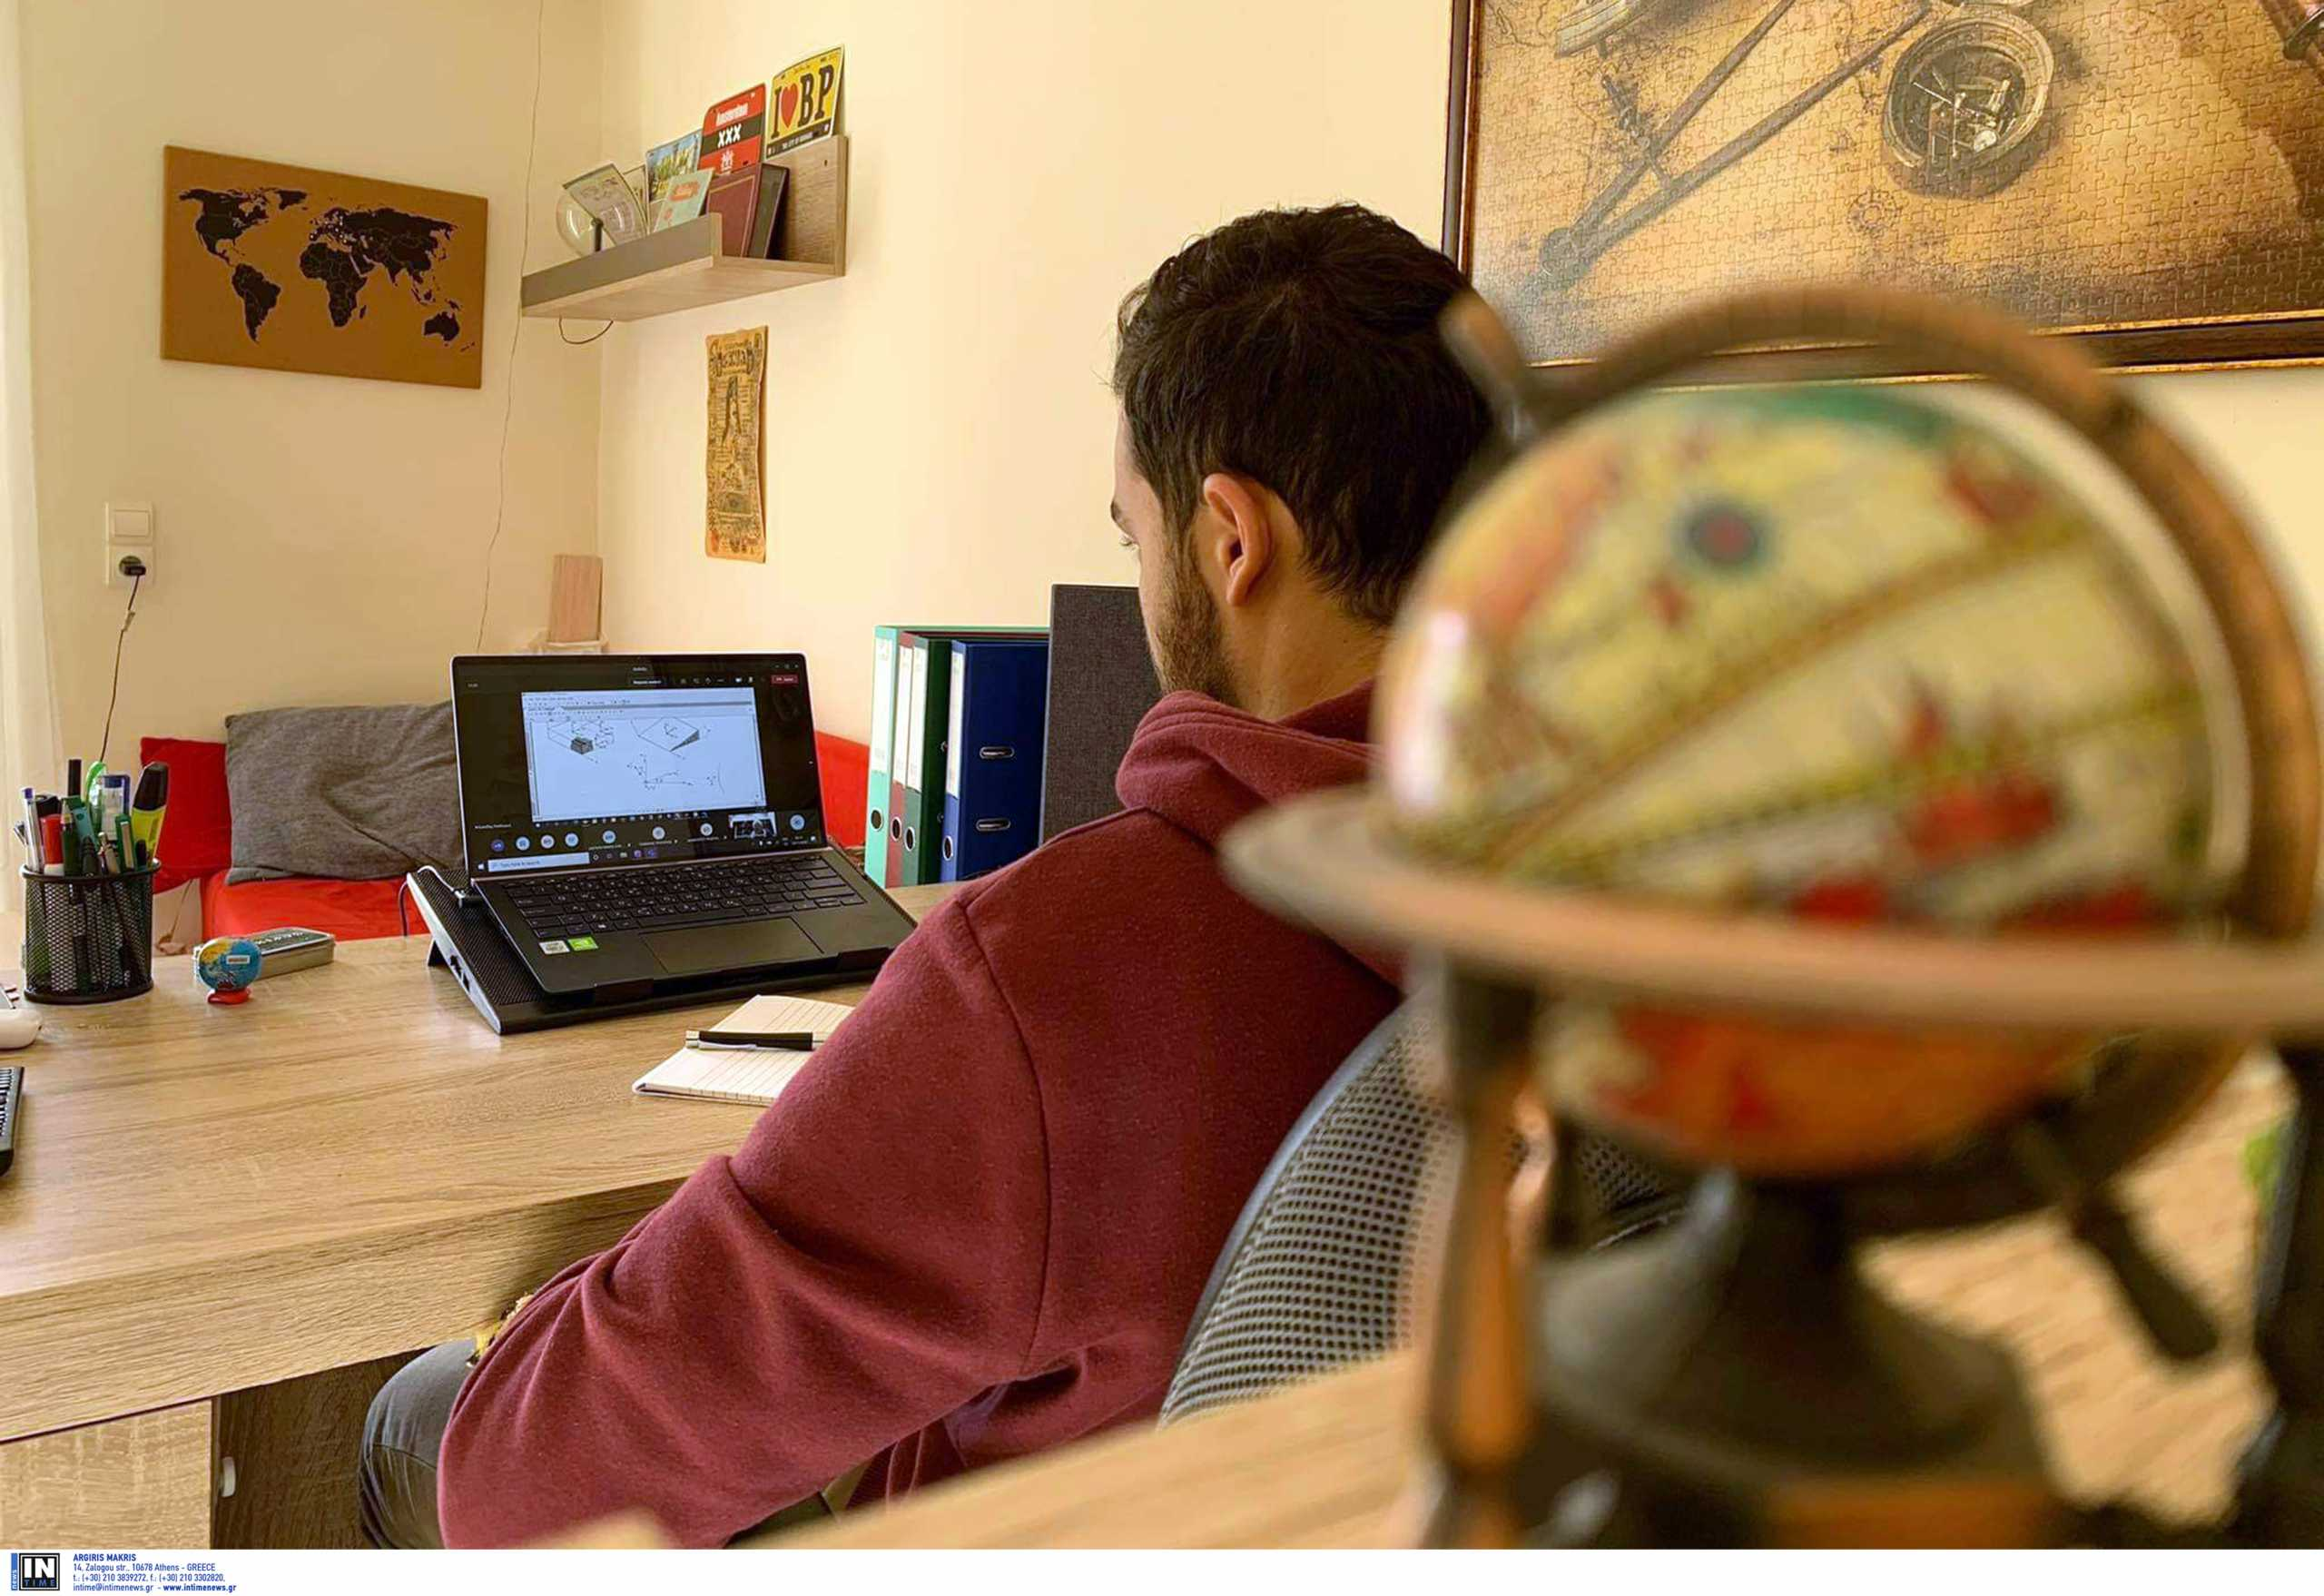 Voucher 200 ευρώ για μαθητές και φοιτητές για αγορά tablet, laptop ή υπολογιστή – Τα κριτήρια